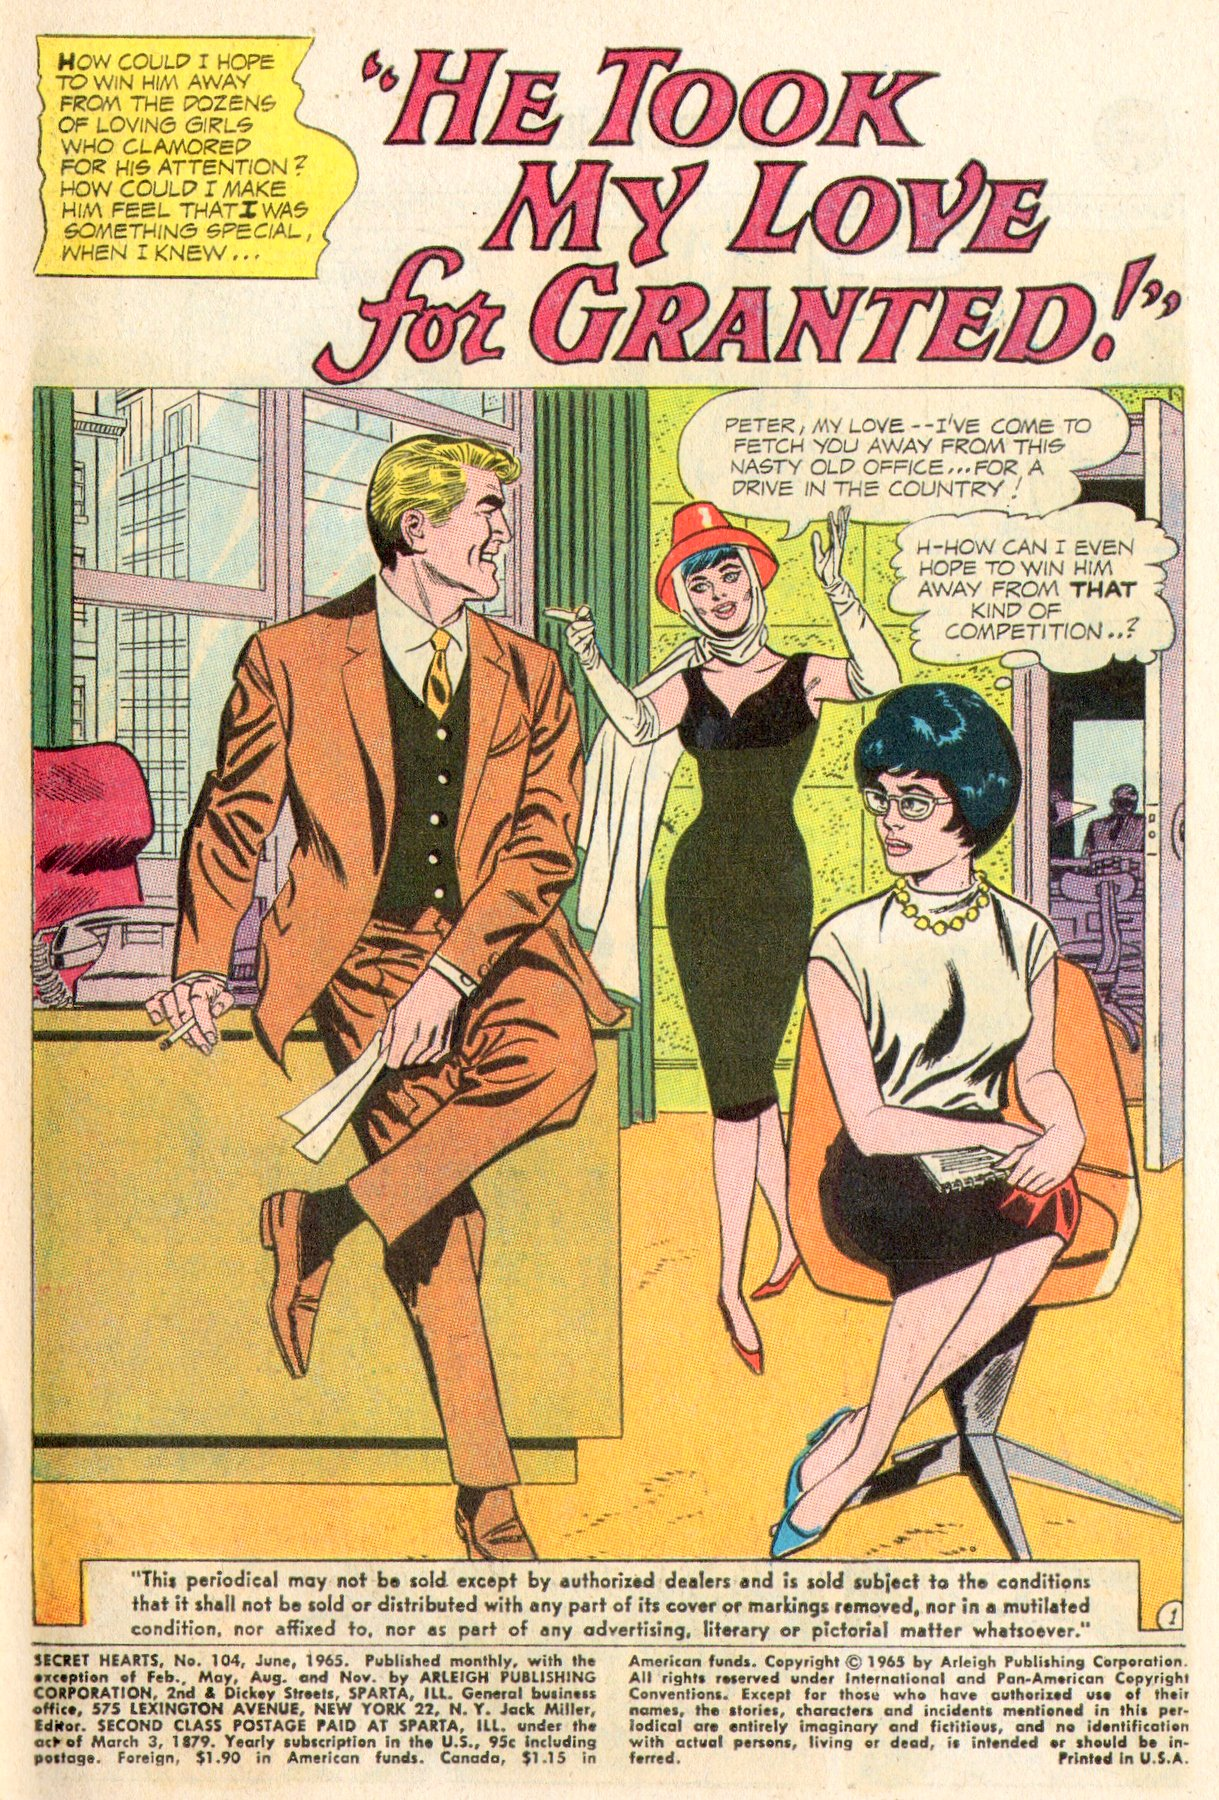 Read online Secret Hearts comic -  Issue #104 - 3